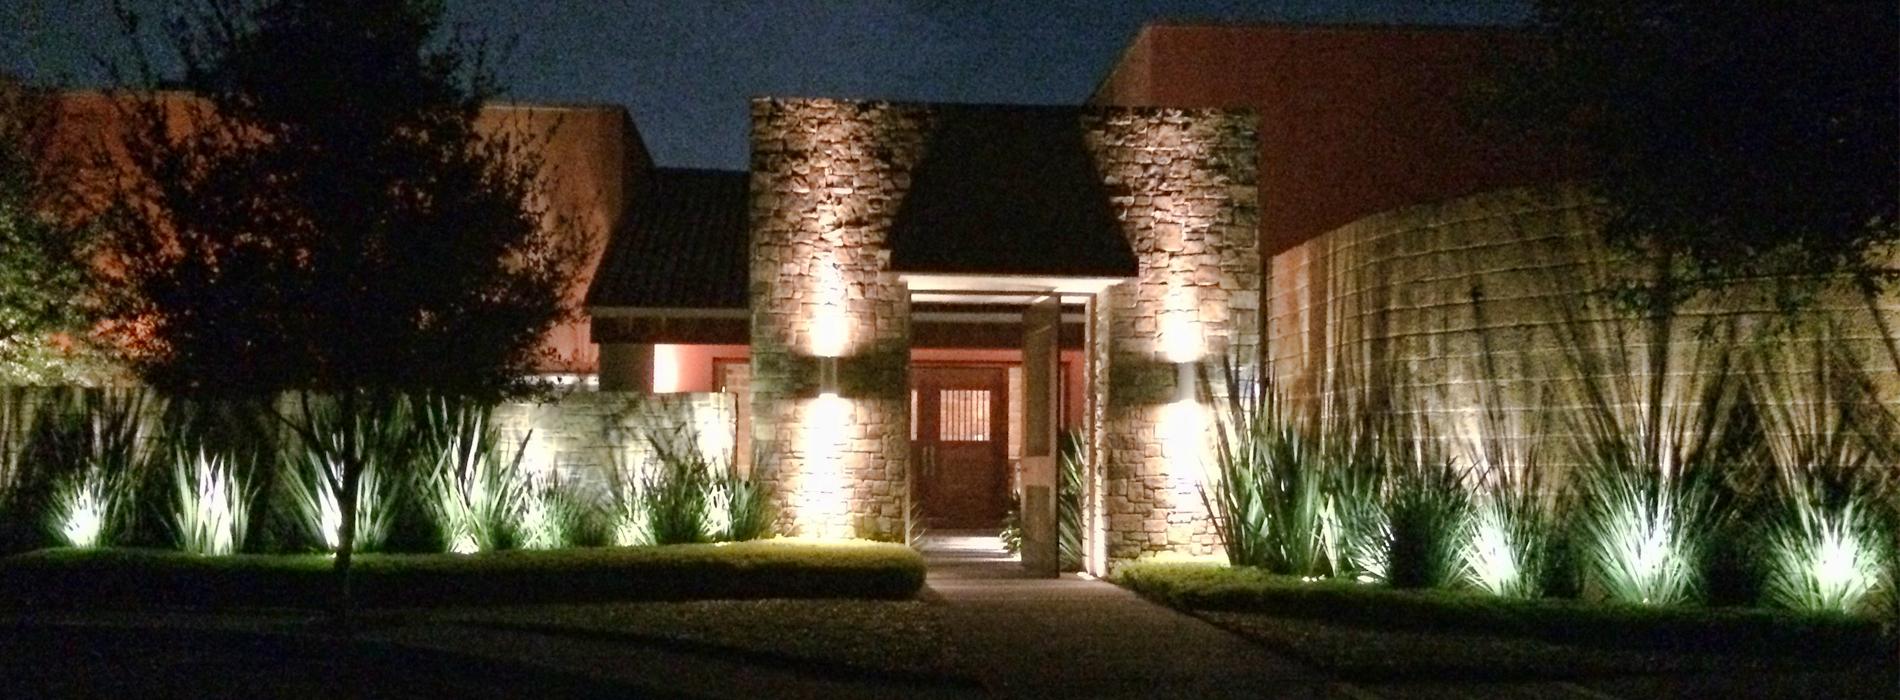 lumipro focos para jardin iluminaci n de exterior On luminarias para jardines exteriores